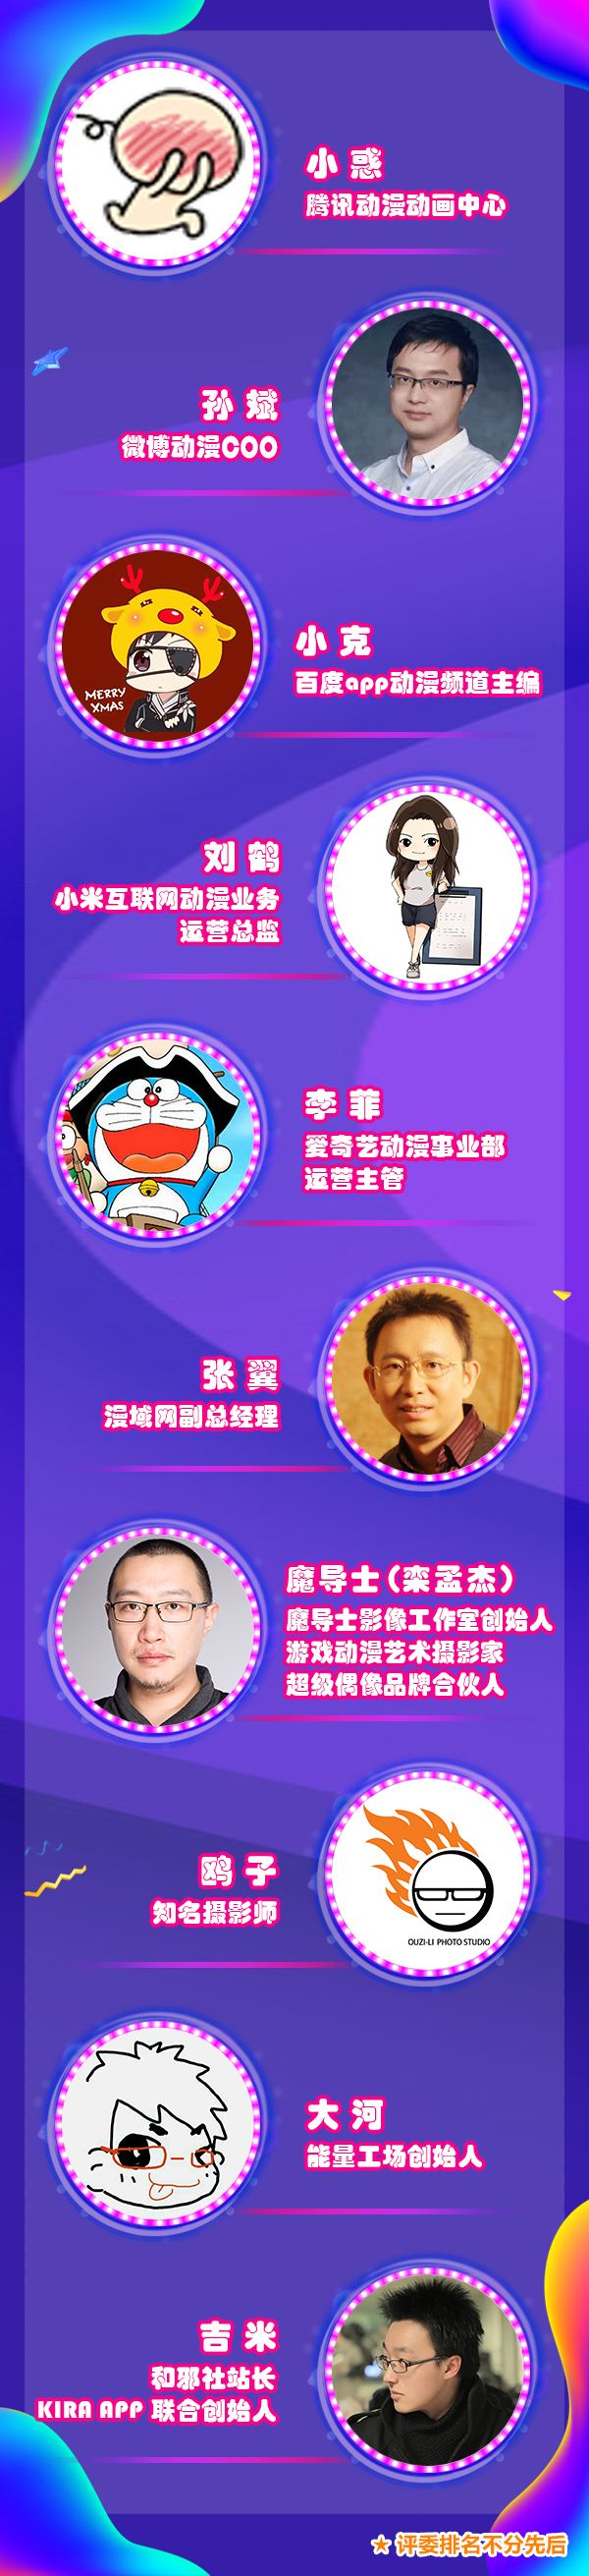 2019ChinaJoy Cosplay封面大赛现已开赛 评委名单正式公布!